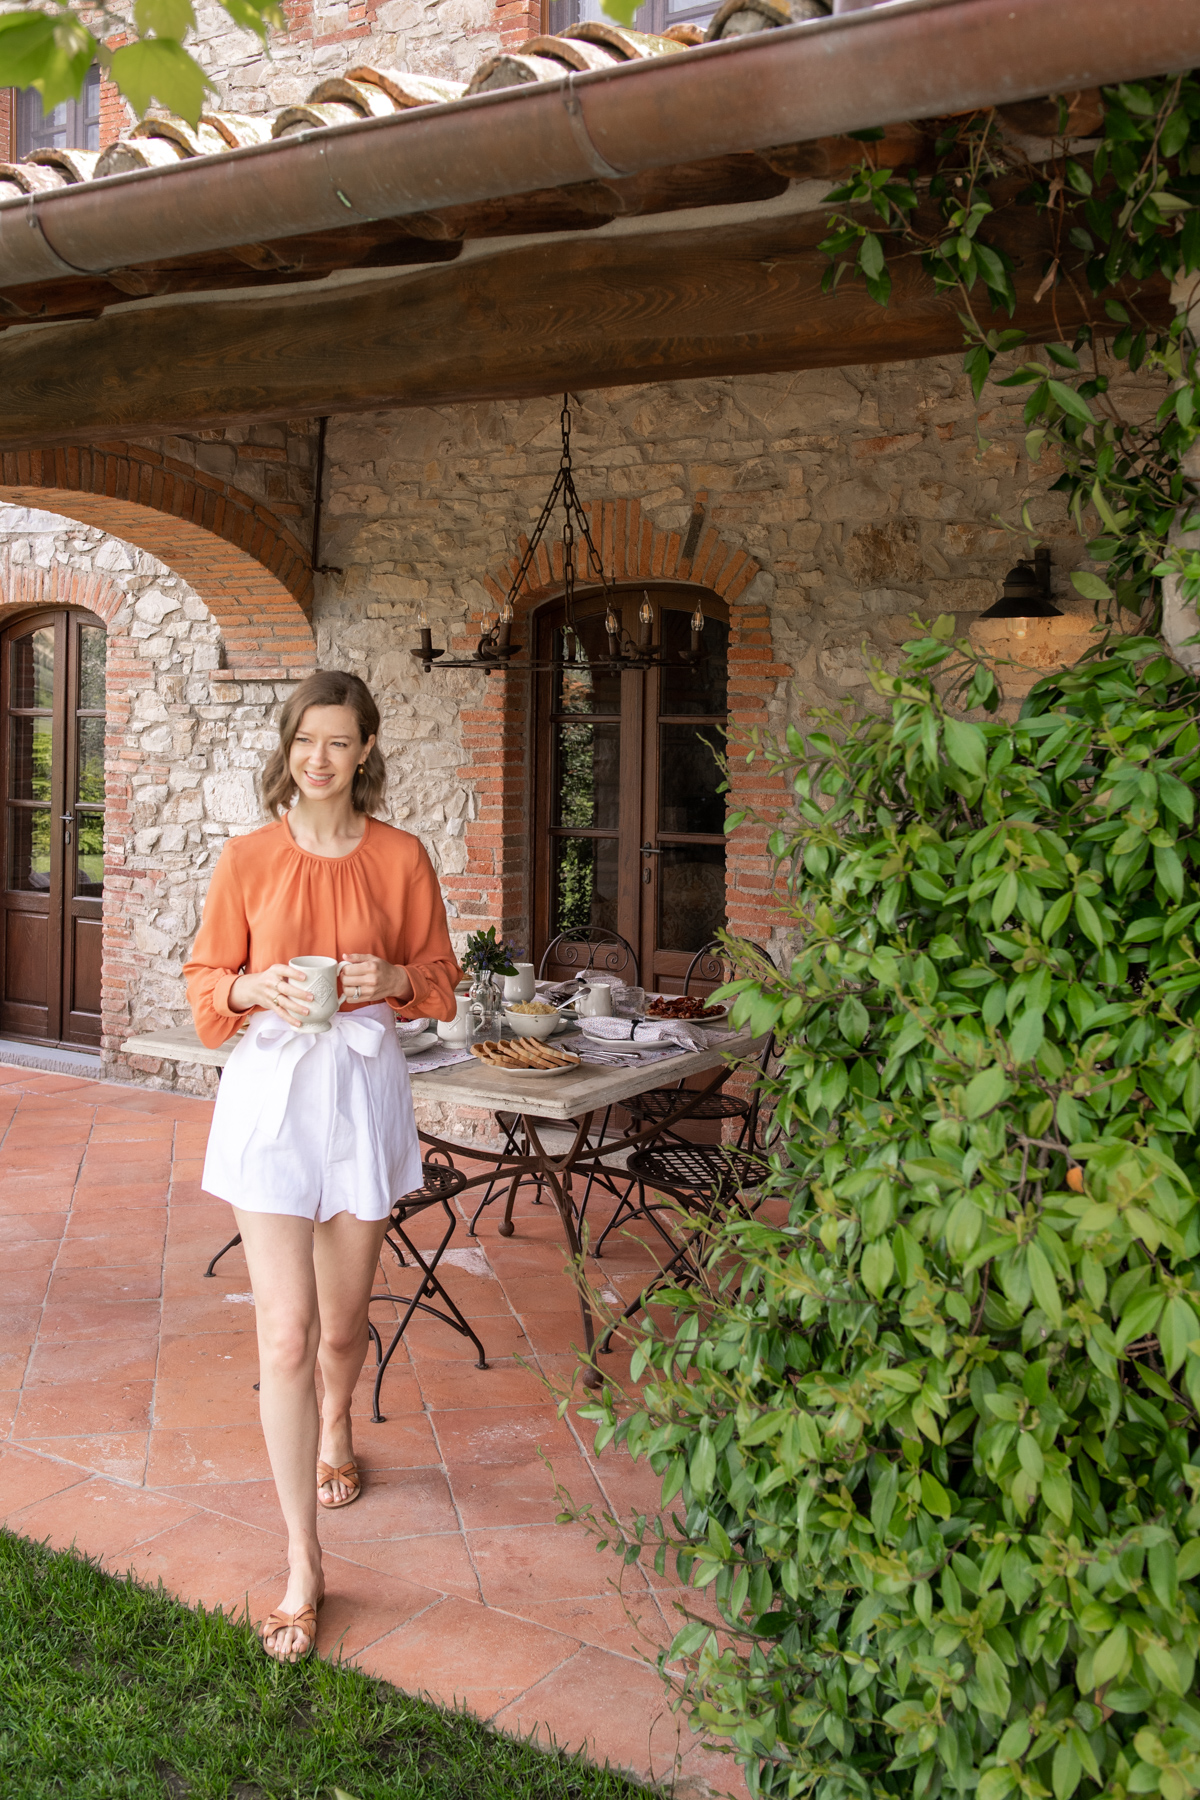 Stacie Flinner x Cuvee Tuscan Farmhouse Tuscany Italy Guide-32.jpg